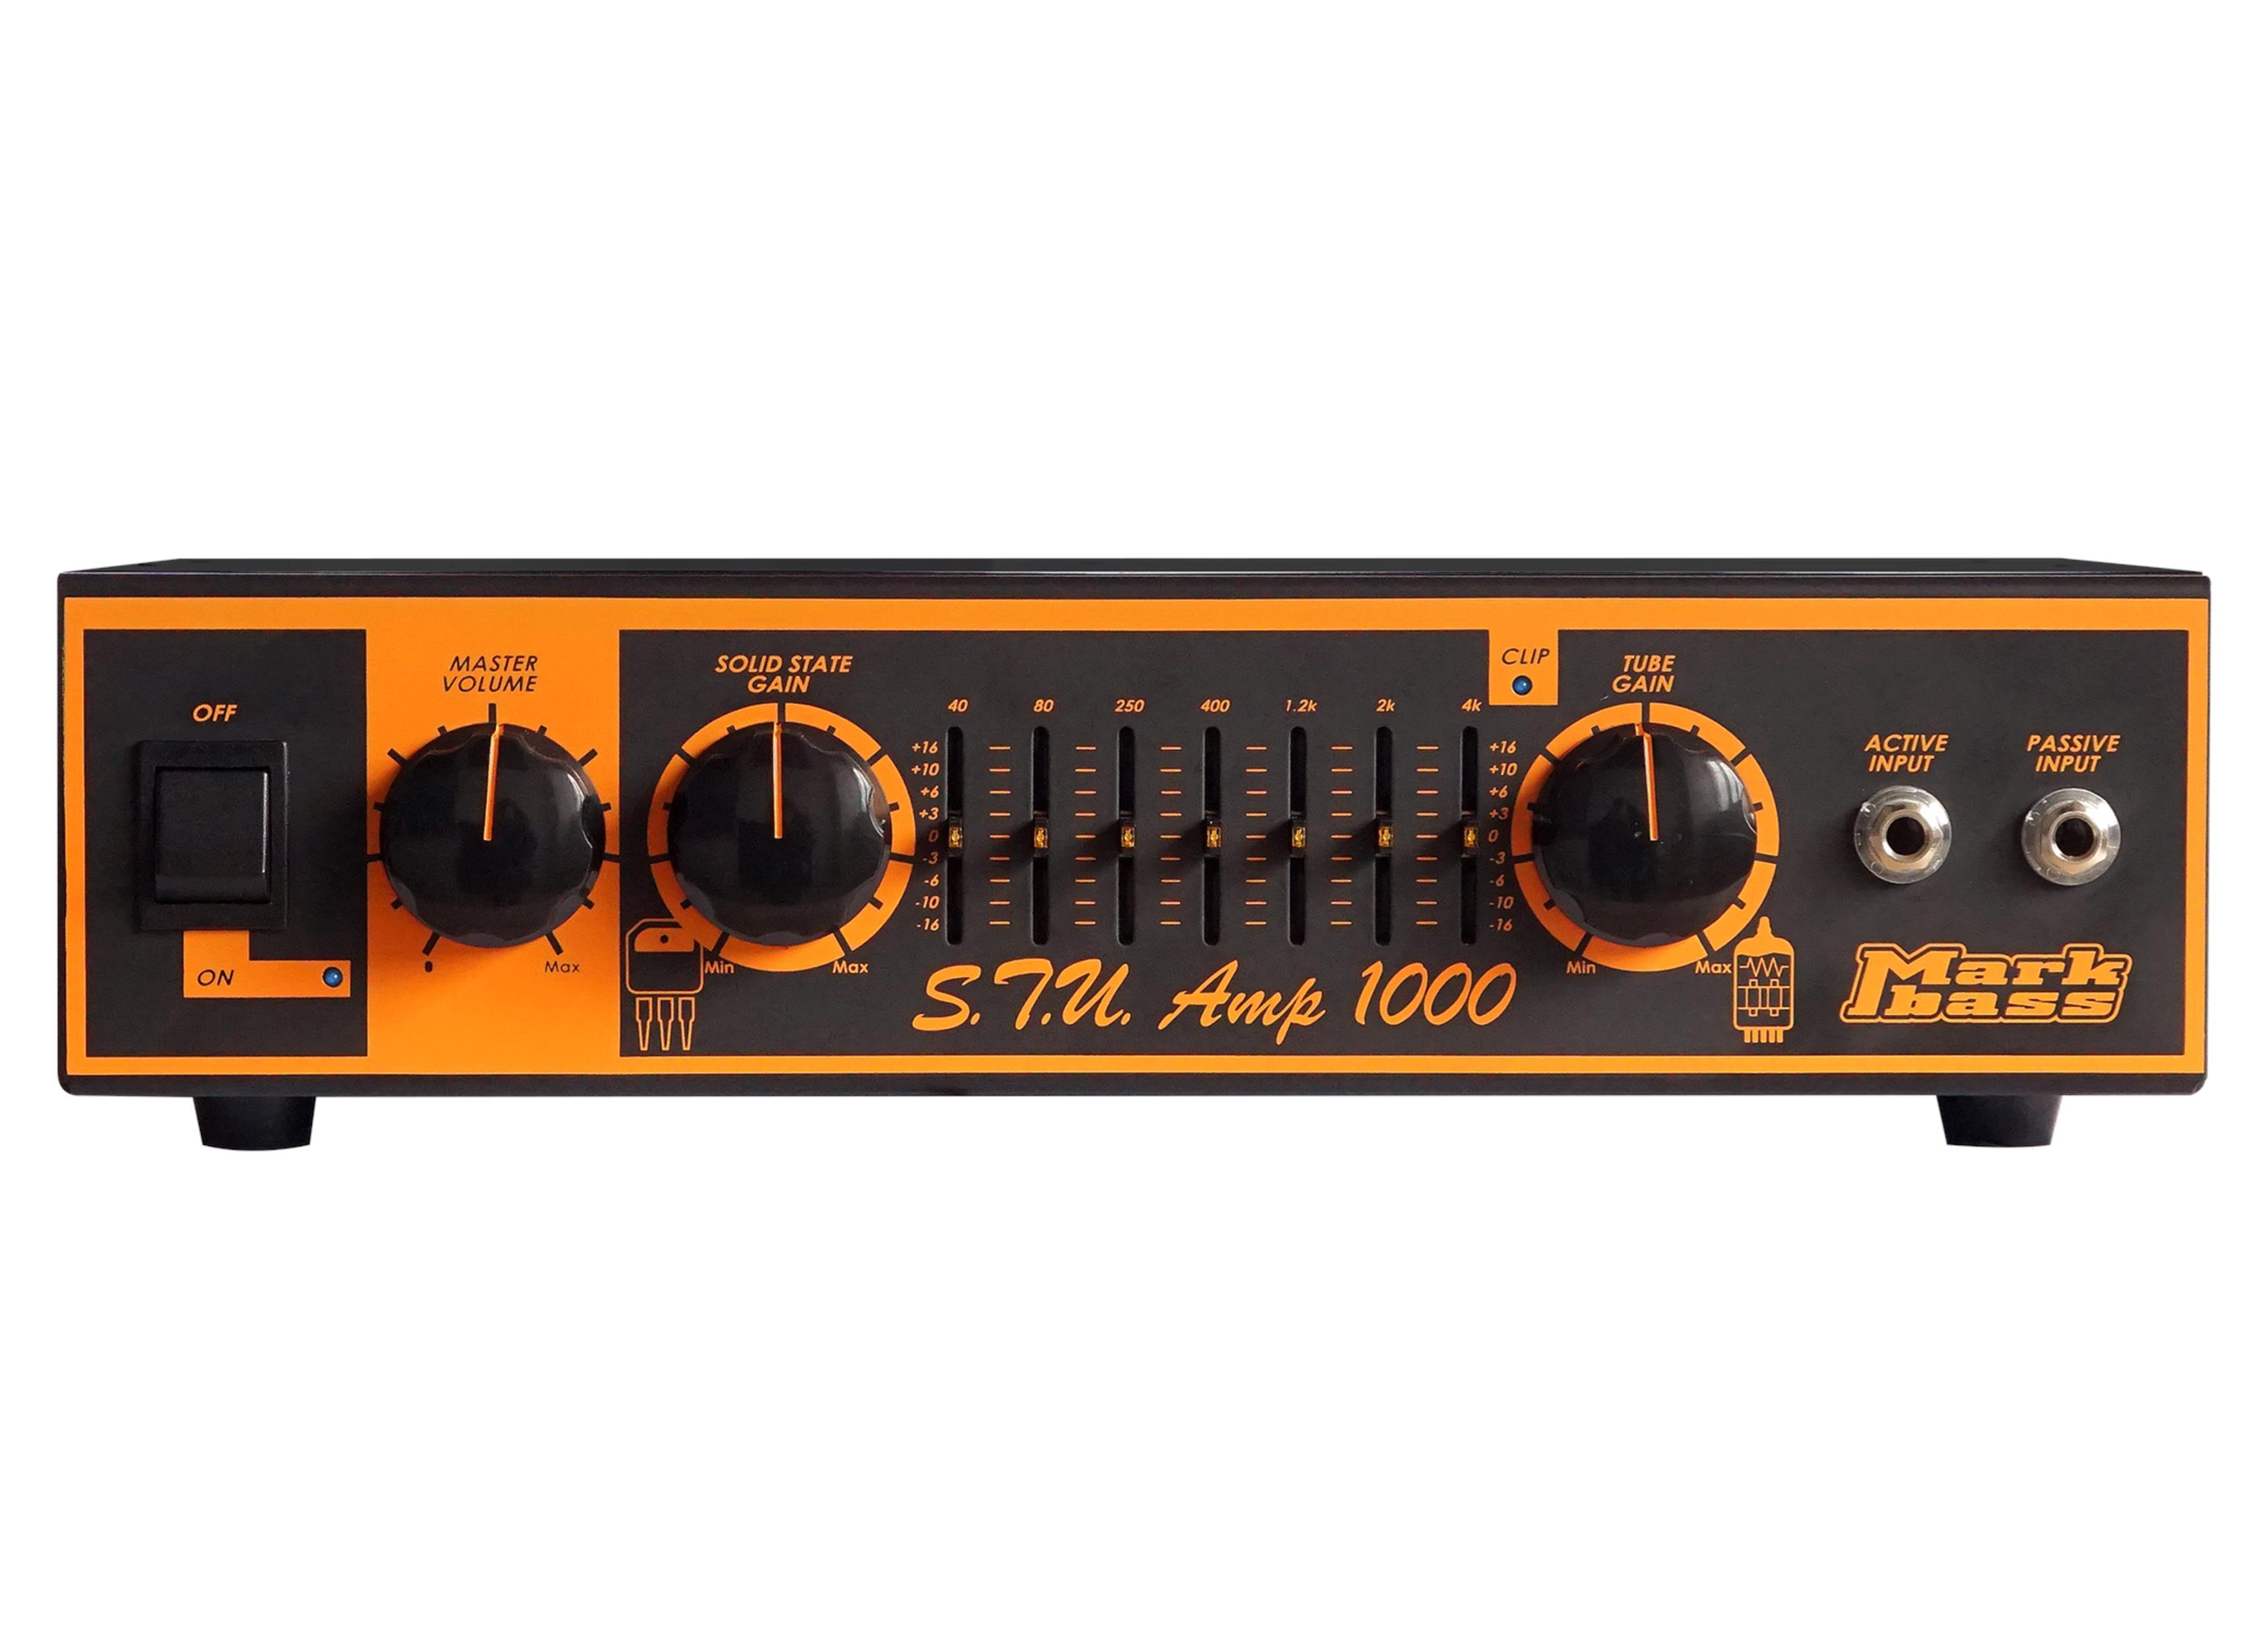 MARKBASS STU AMP 1000 STUART HAMM - Bassi Amplificatori - Testate